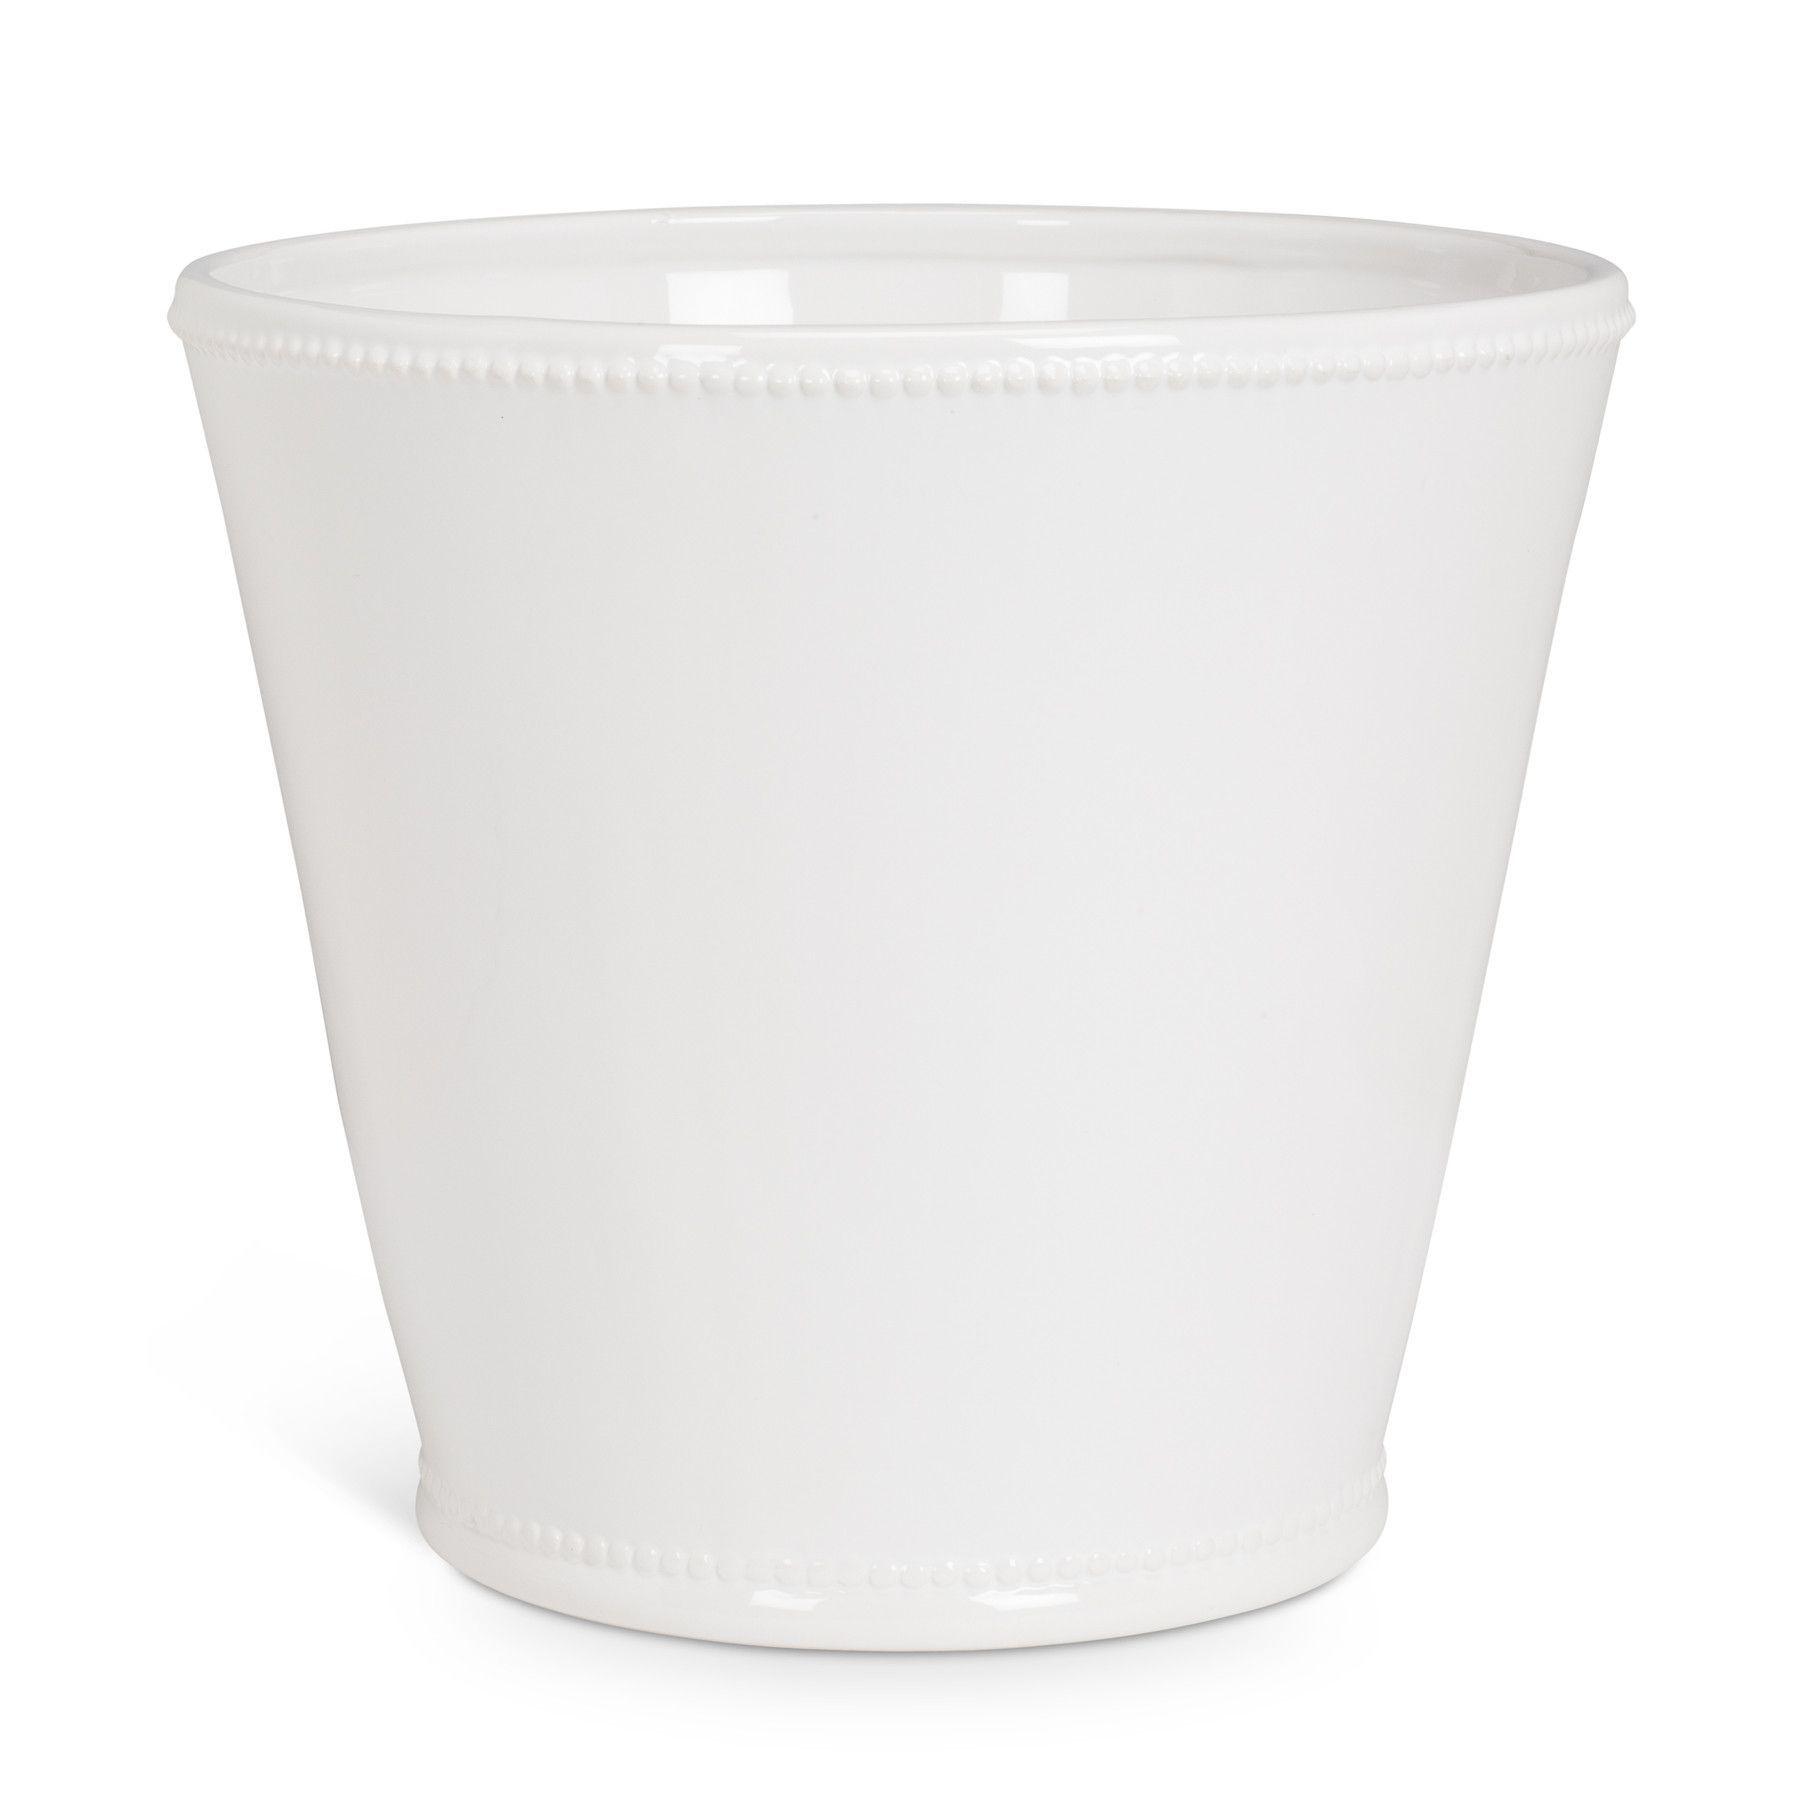 White Ceramic Planters With Beaded Trim White Ceramic 400 x 300